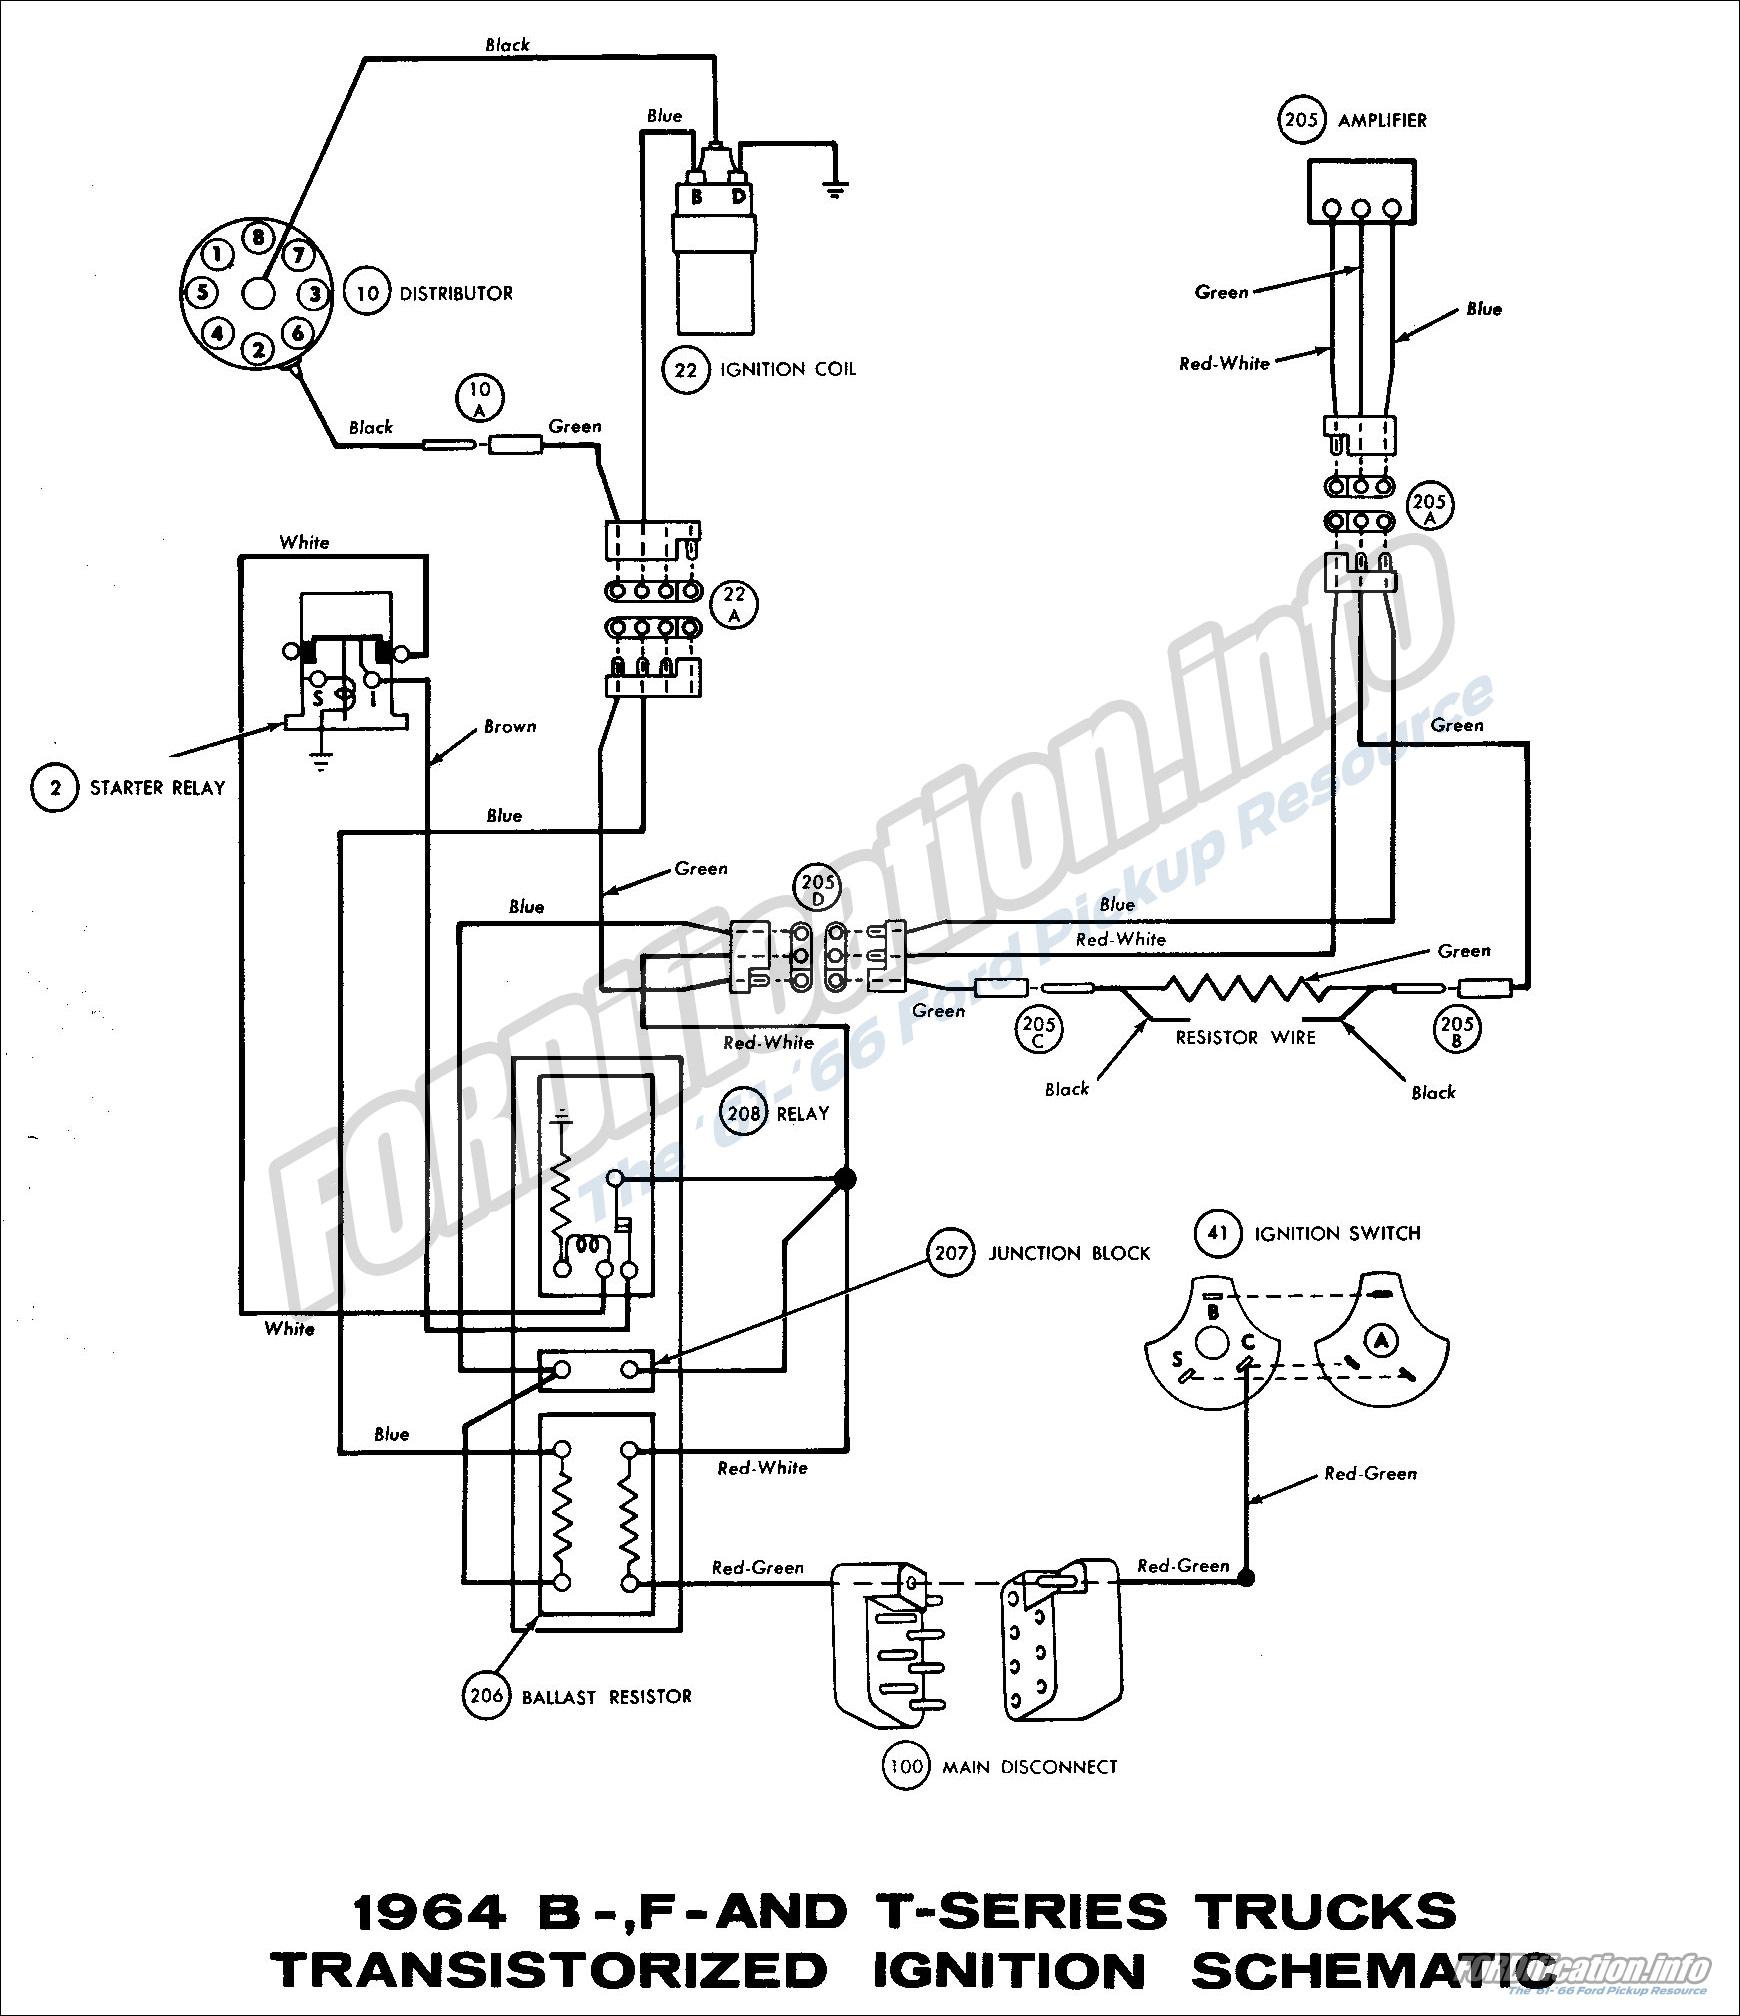 1973 ford f 250 ignition switch wiring diagram wv 5375  isuzu npr wiring diagram additionally 1965 ford falcon  wv 5375  isuzu npr wiring diagram